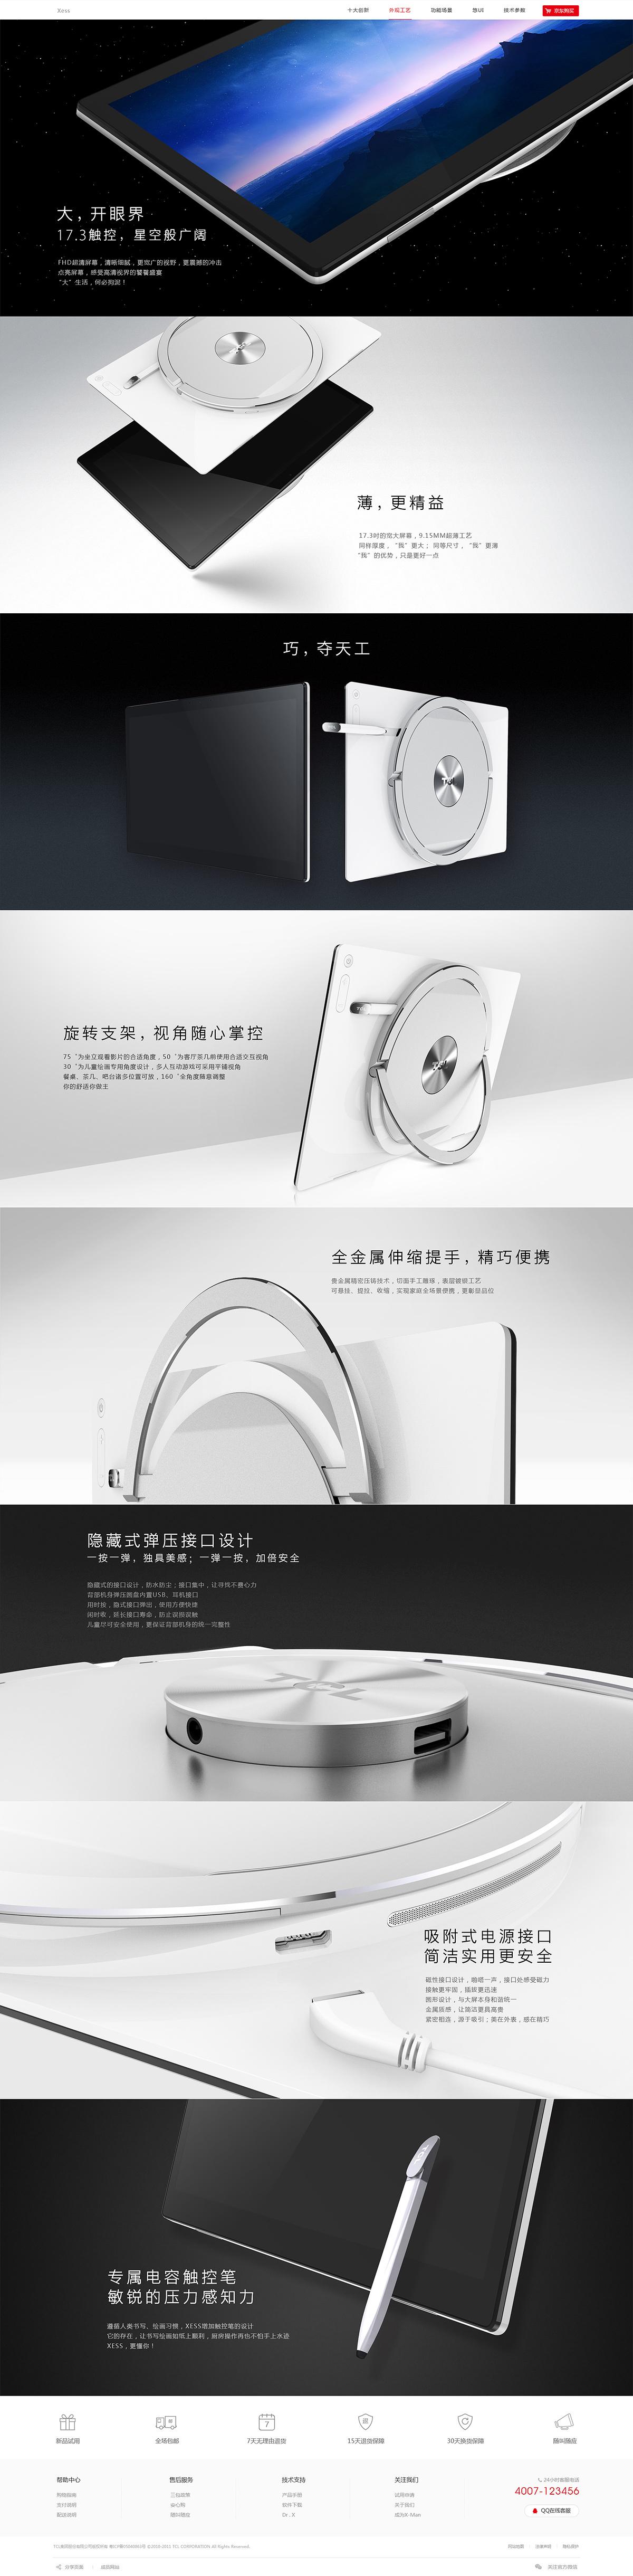 TCL网站设计